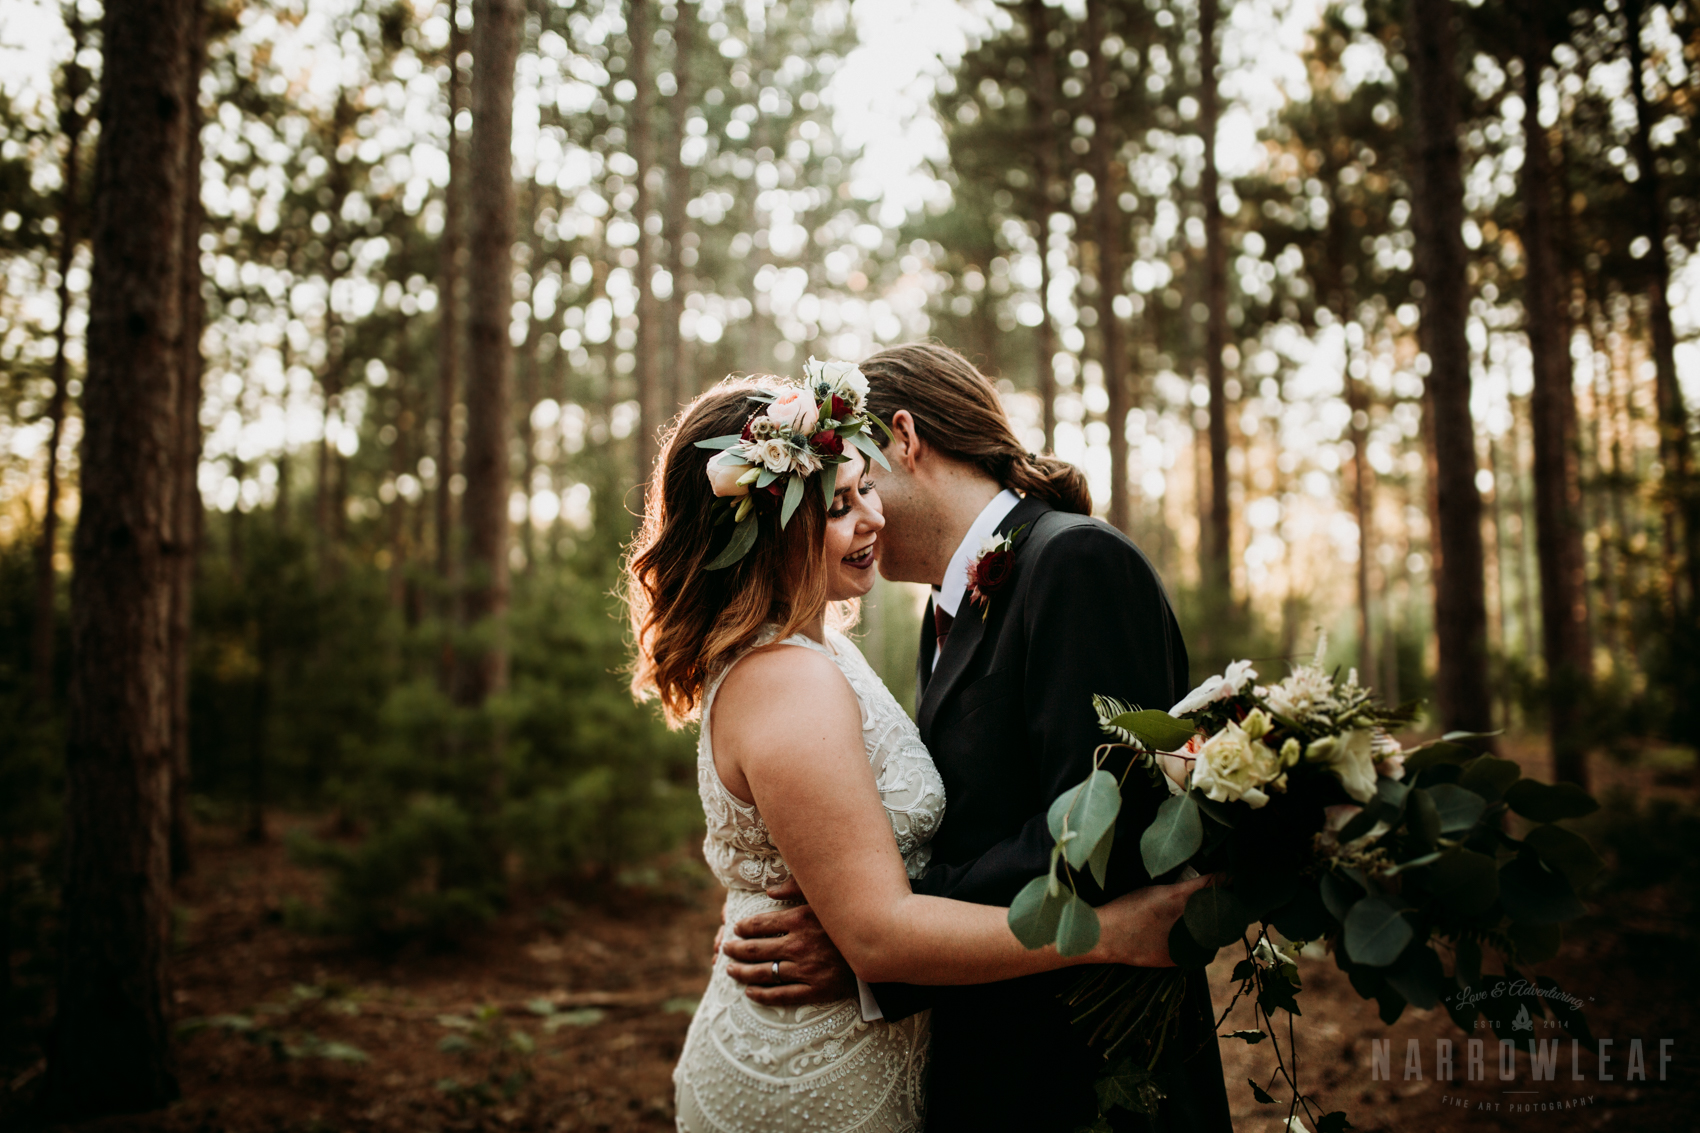 woodsy-bride-groom-romantic-sunset-burlap-and-bells-wi-Narrowleaf-Adventure-Photography-3.jpg